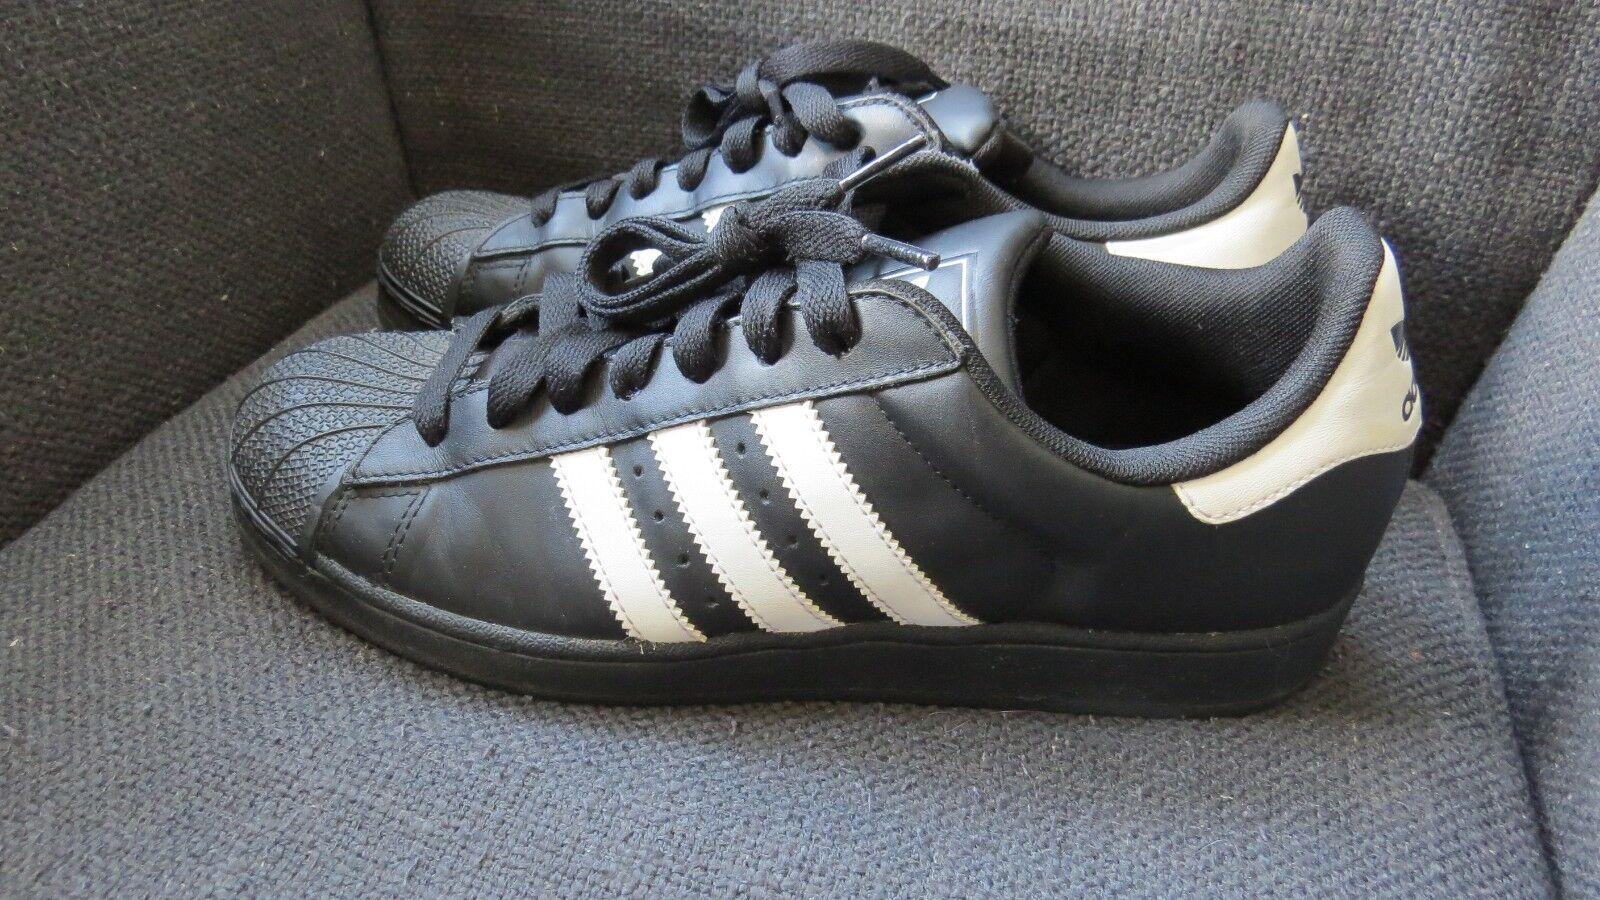 Adidas Superstar noir /blanc hommes Trainers Chaussures 9 no box